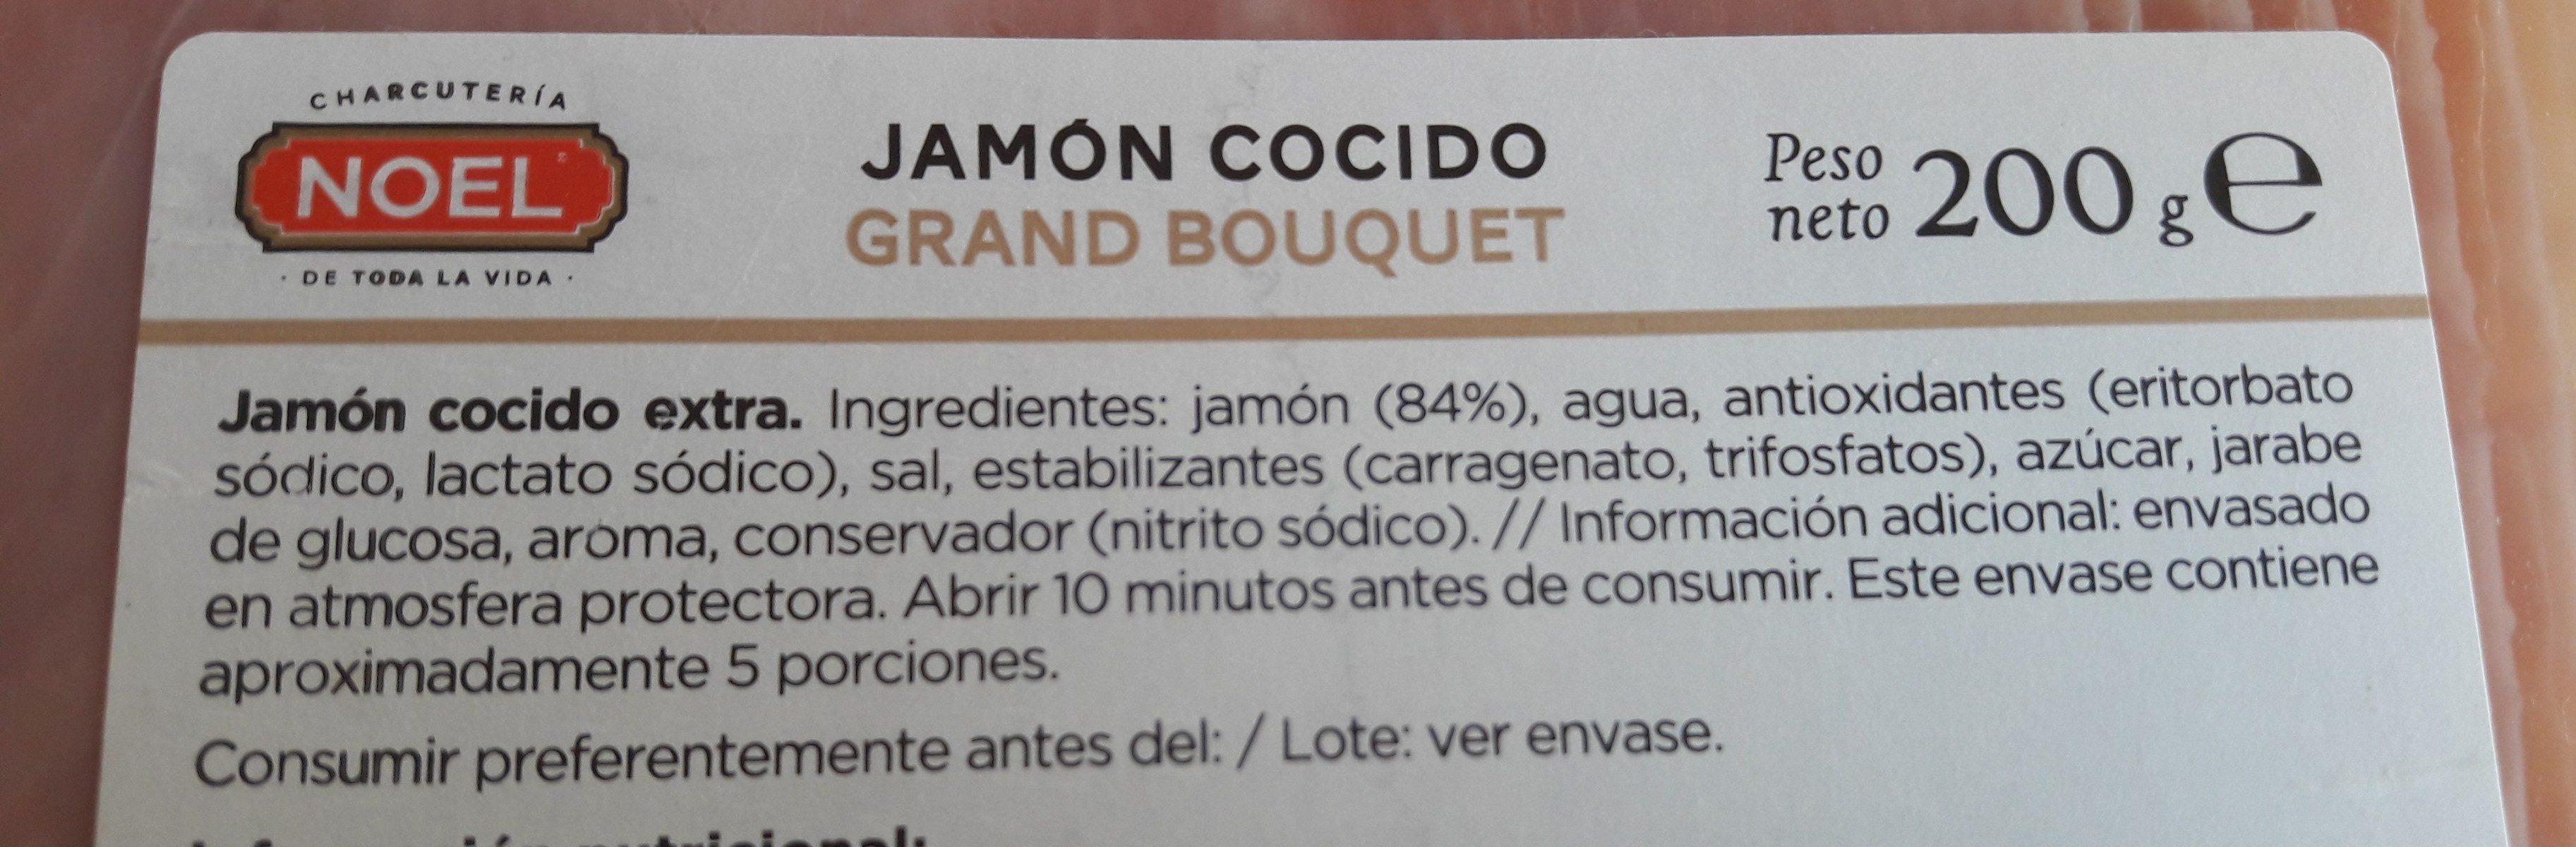 Grand bouquet jamon cocido extra - Ingredientes - fr